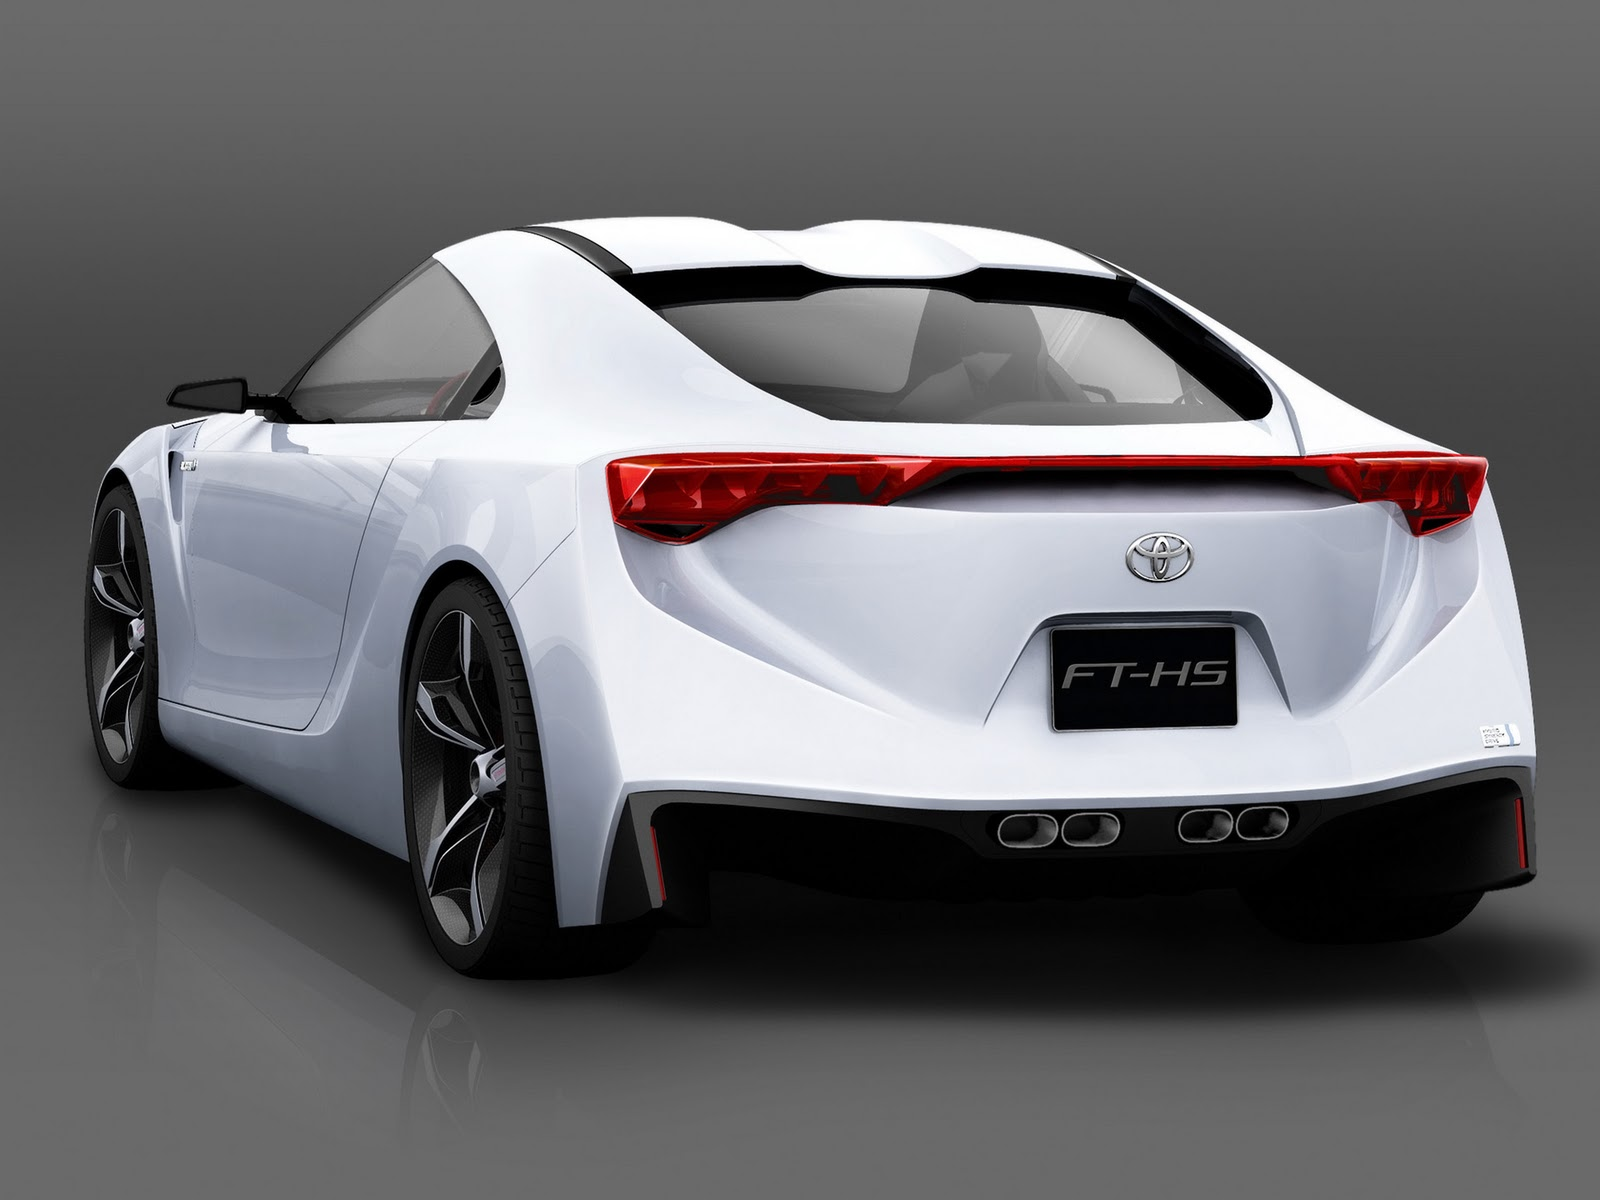 https://3.bp.blogspot.com/_gPeq-uTqpJQ/TTmpNAfCQsI/AAAAAAAAADQ/Pp9TrikyyA4/s1600/2007-Toyota-FT-HS-Concept-Rear-Angle-Studio-1920x1440.jpg